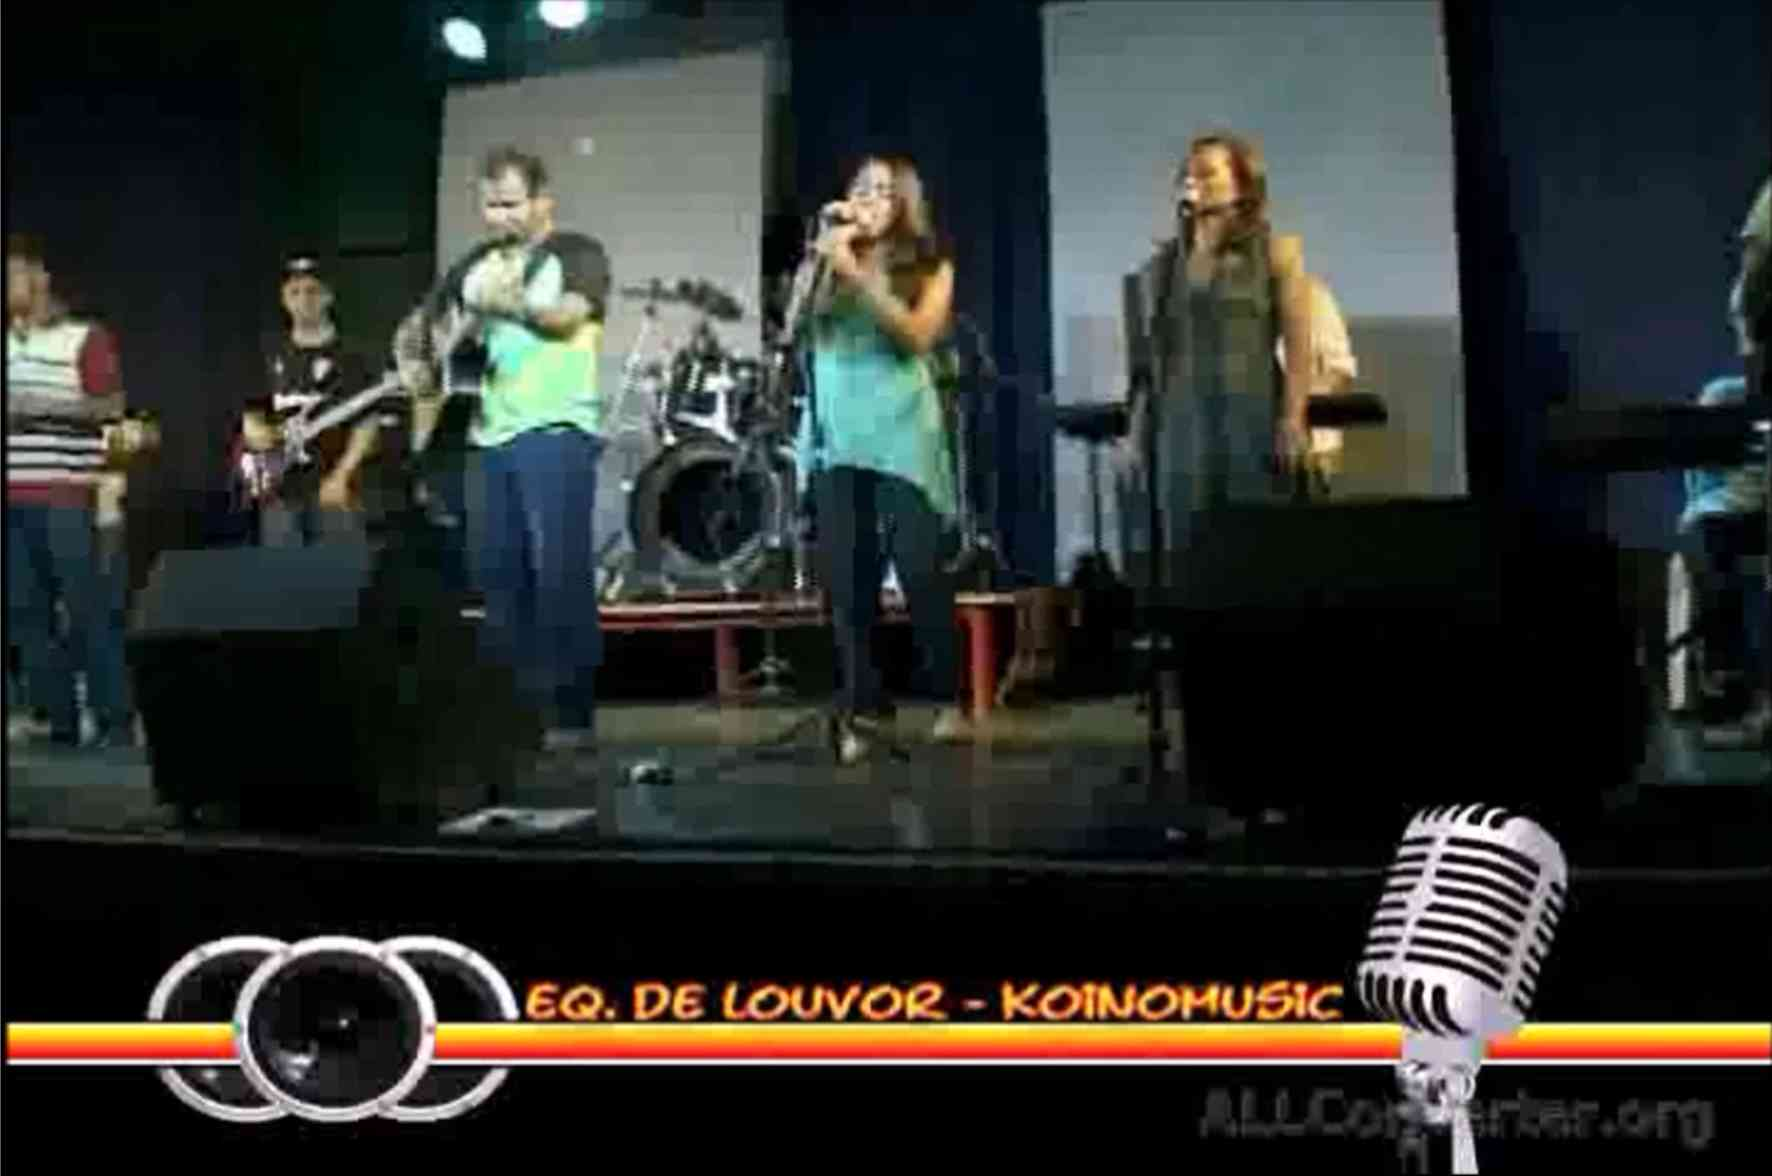 Projeto_Koinomusic_Filme_02_07